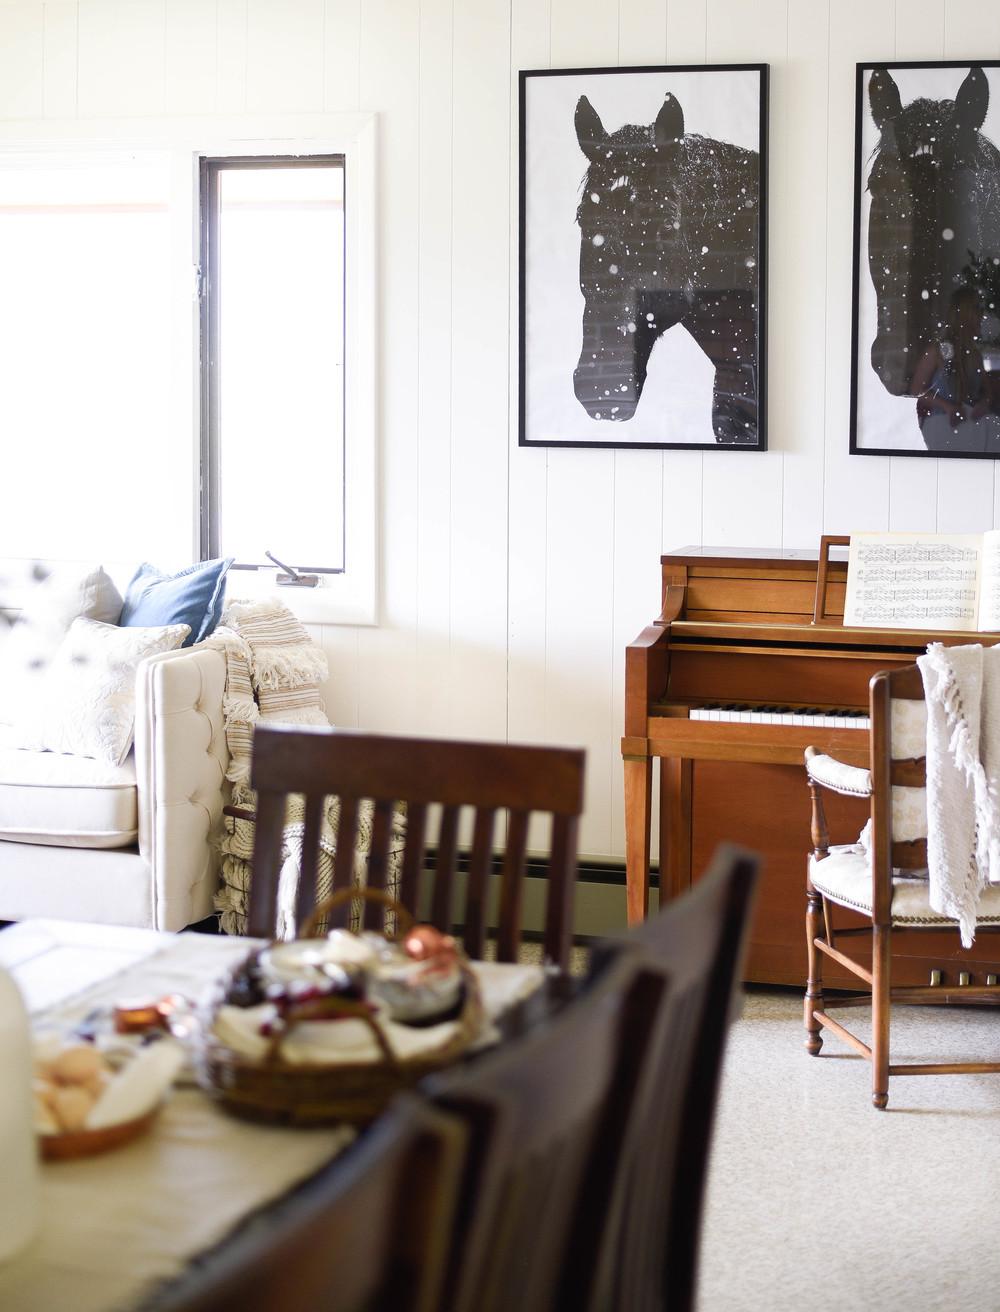 DIY large print frames from ikea | boxwoodavenue.com | rachel l'antigua photography